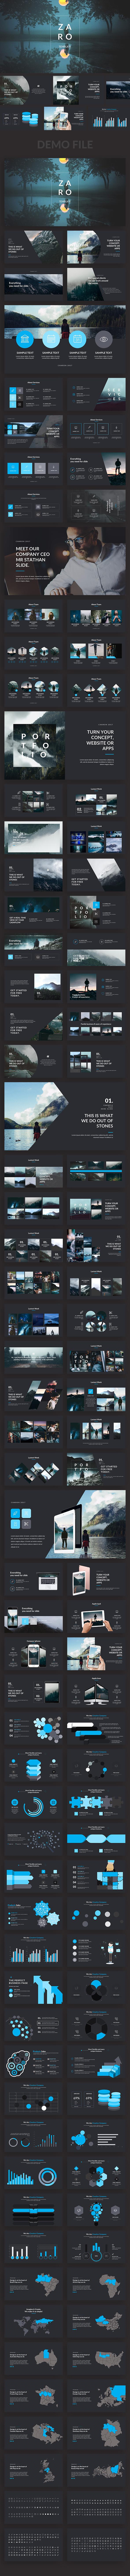 Zaro Premium Google Slide Template - Google Slides Presentation Templates